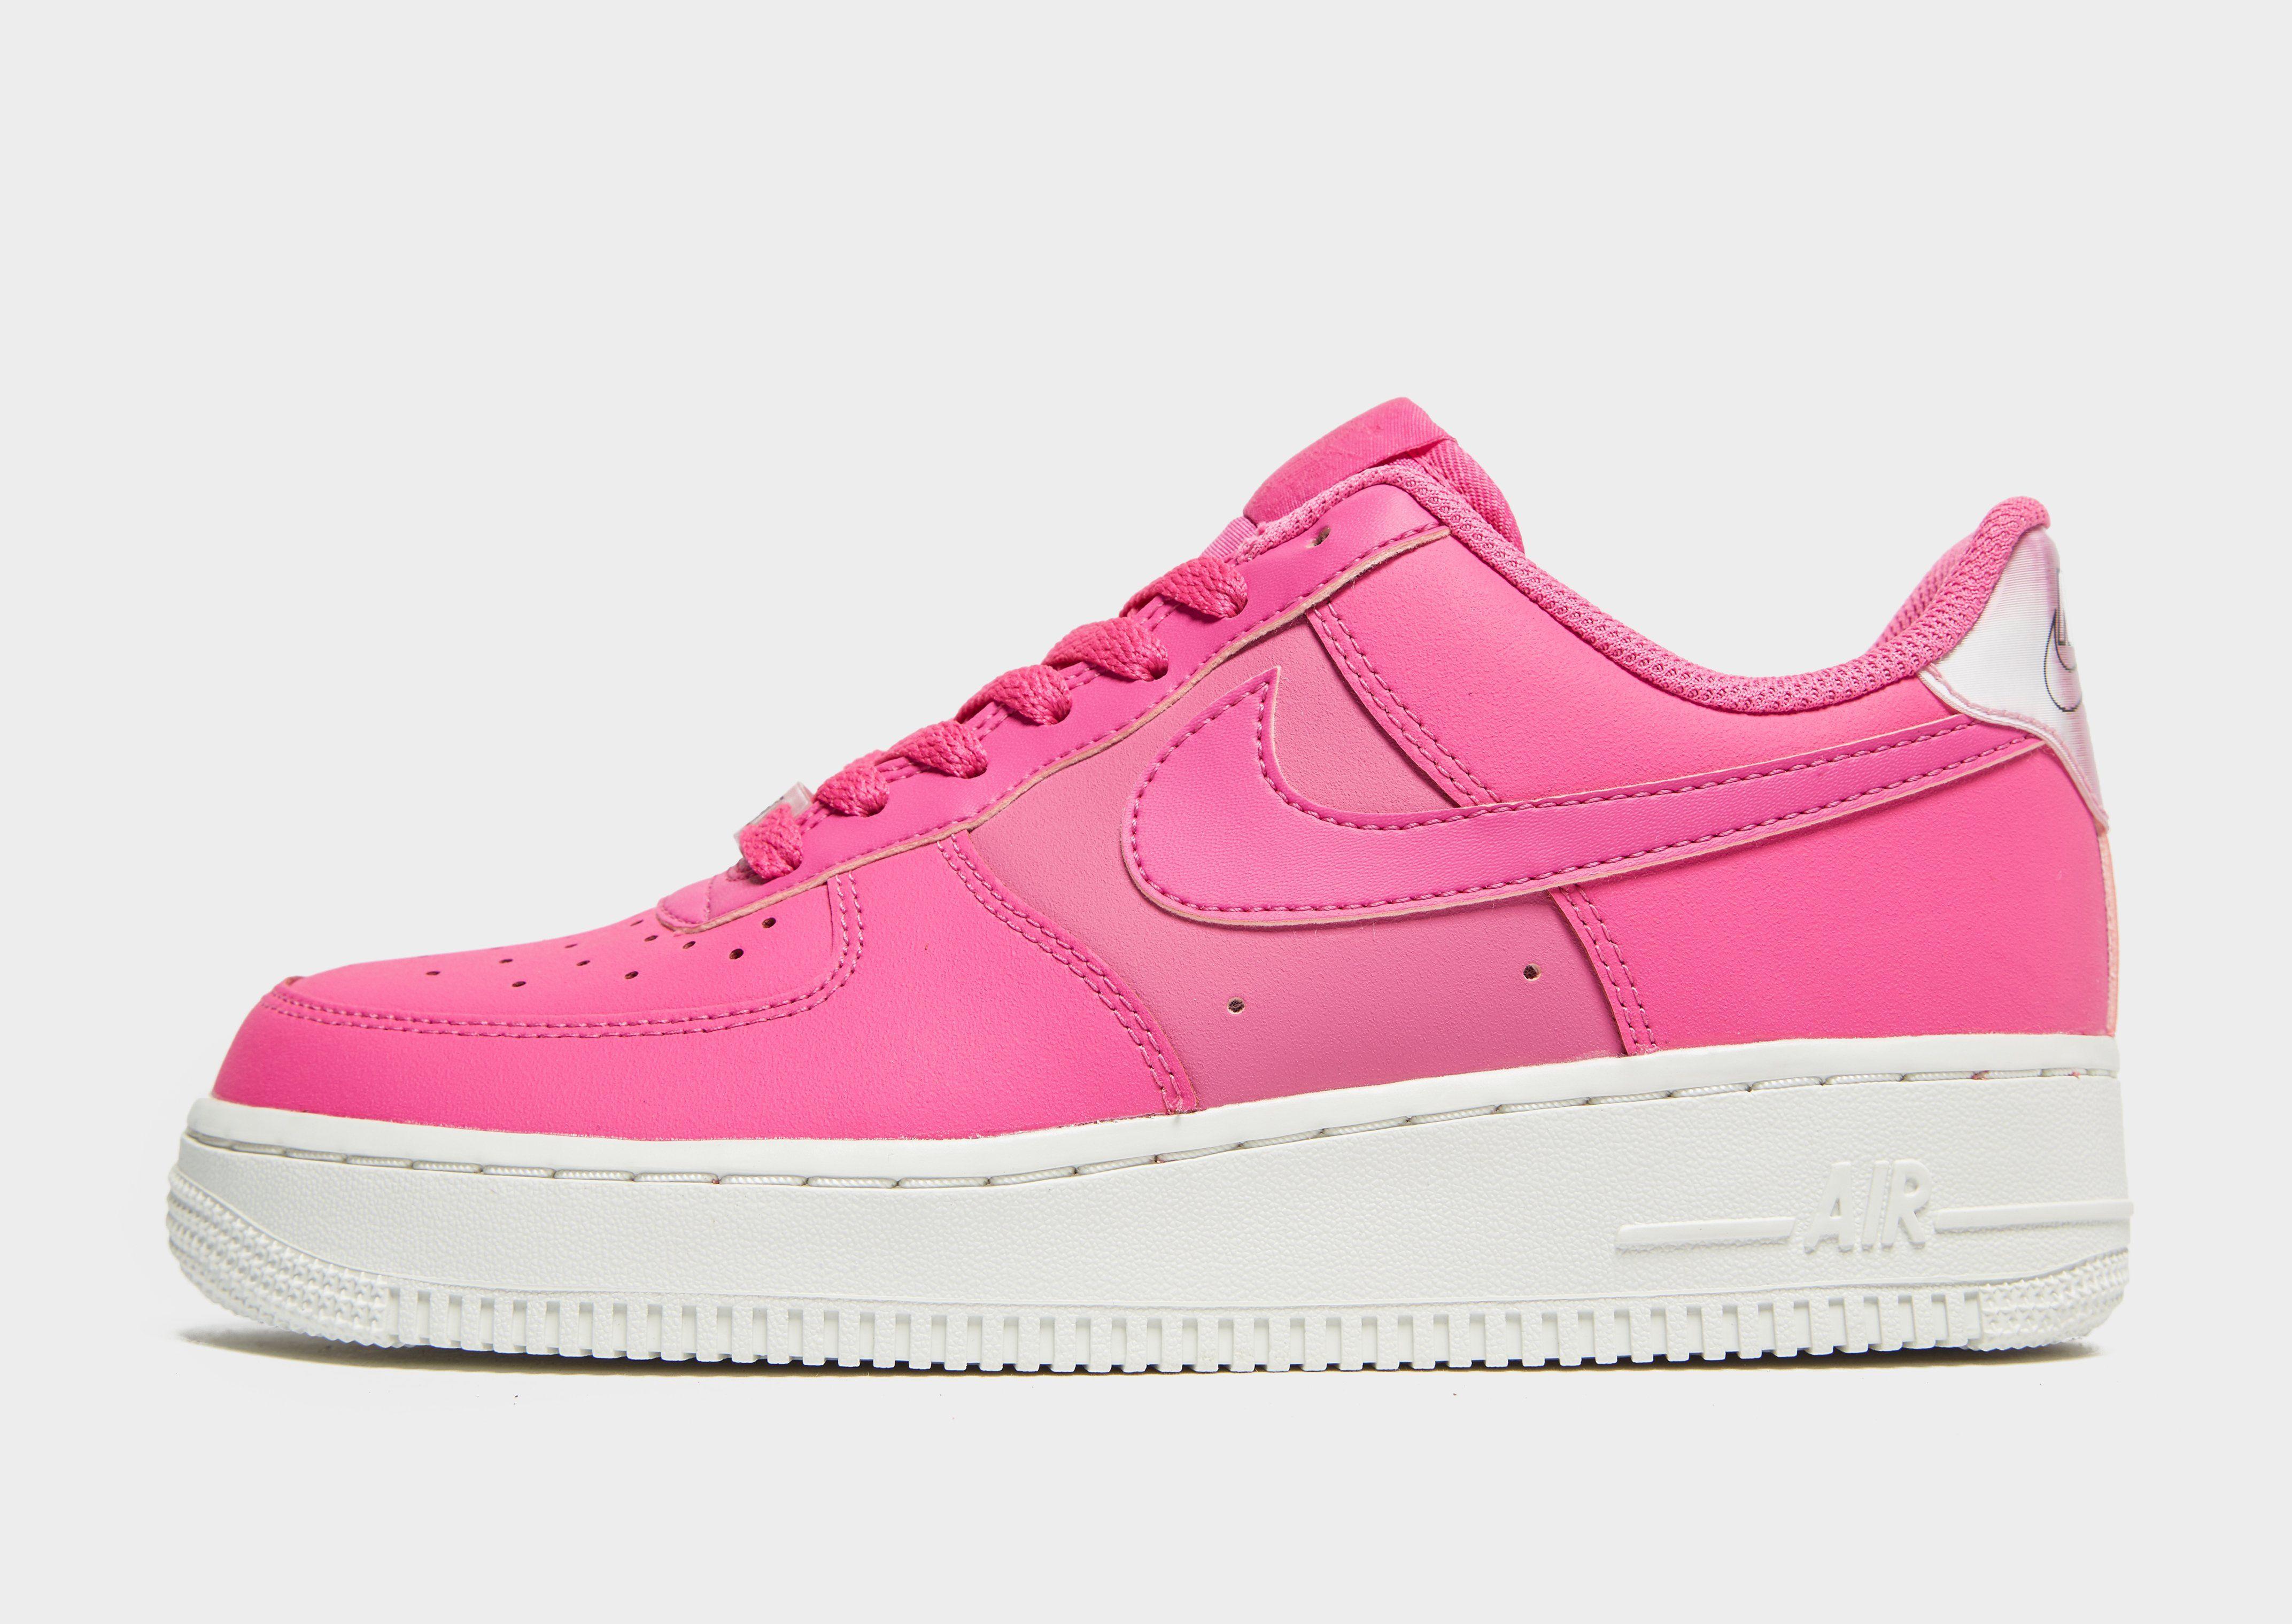 Nike Air Force 1 Pink